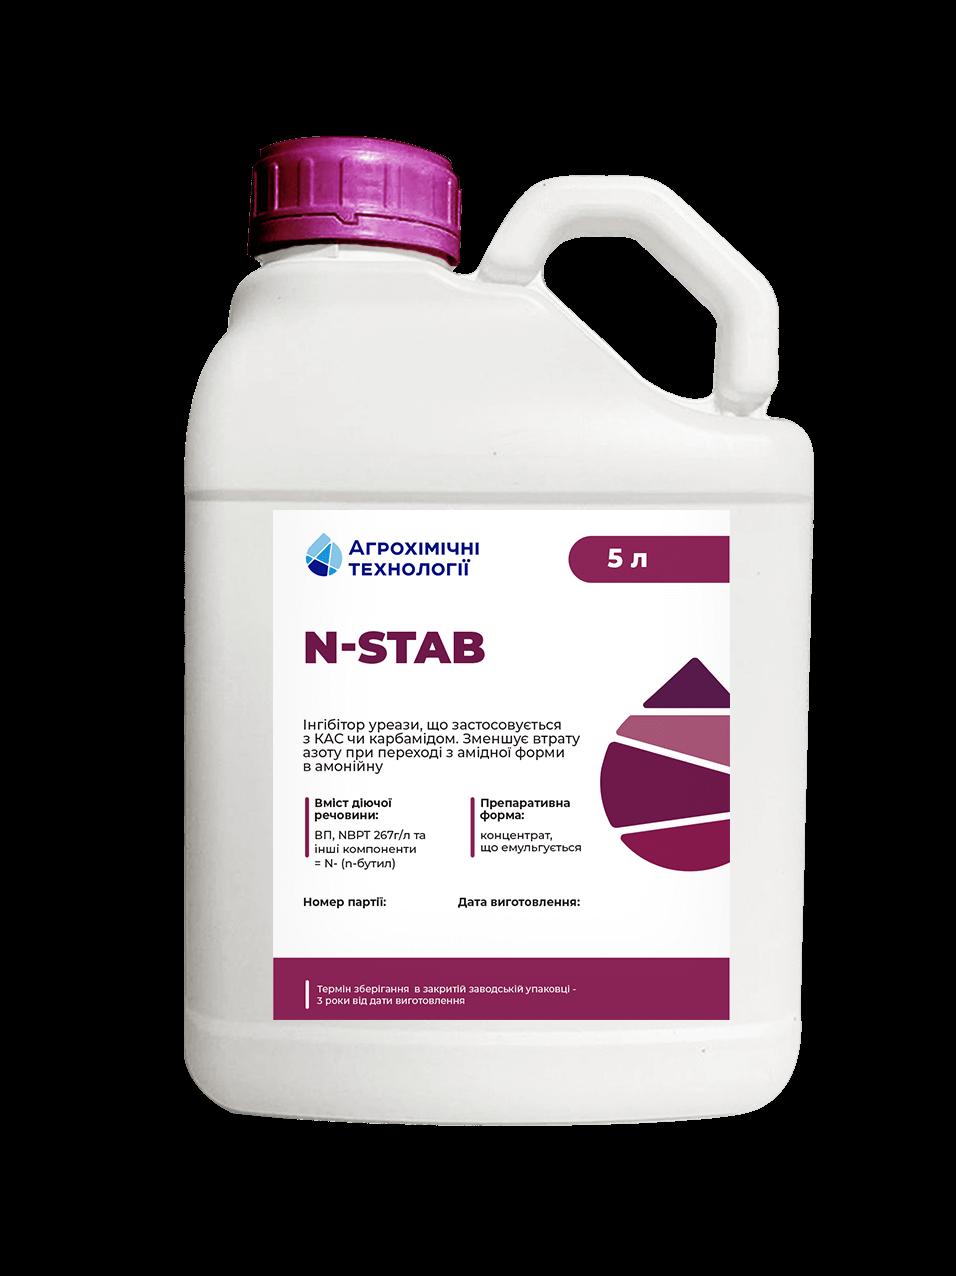 n-stab, зменшення втрат азоту, уменьшения потерь азота